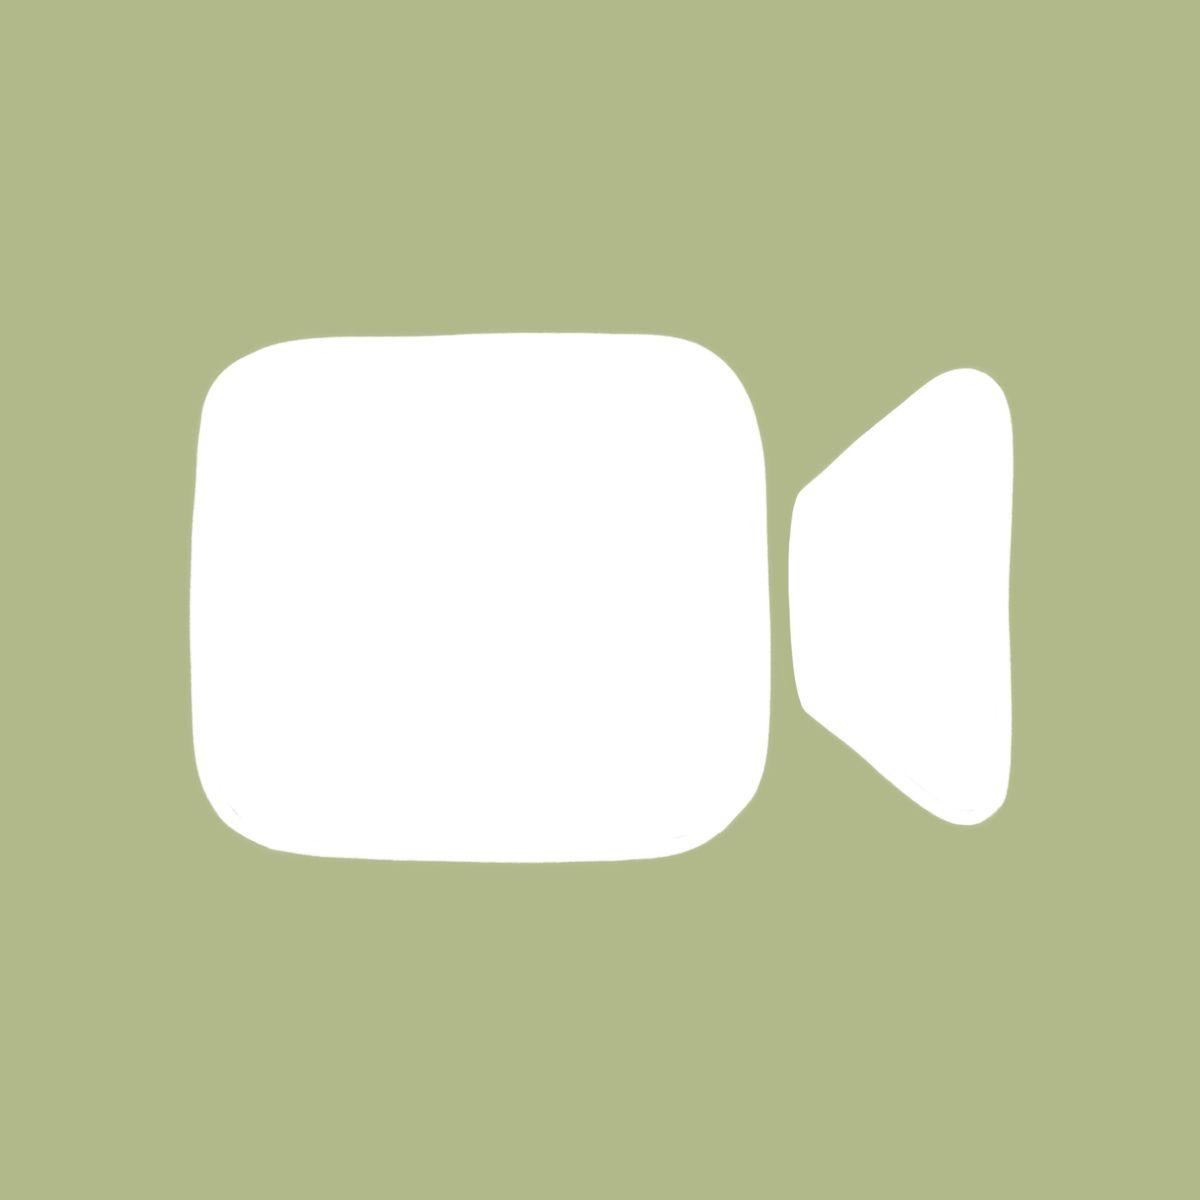 Facetime App Cover App Covers App Icon Sticker App